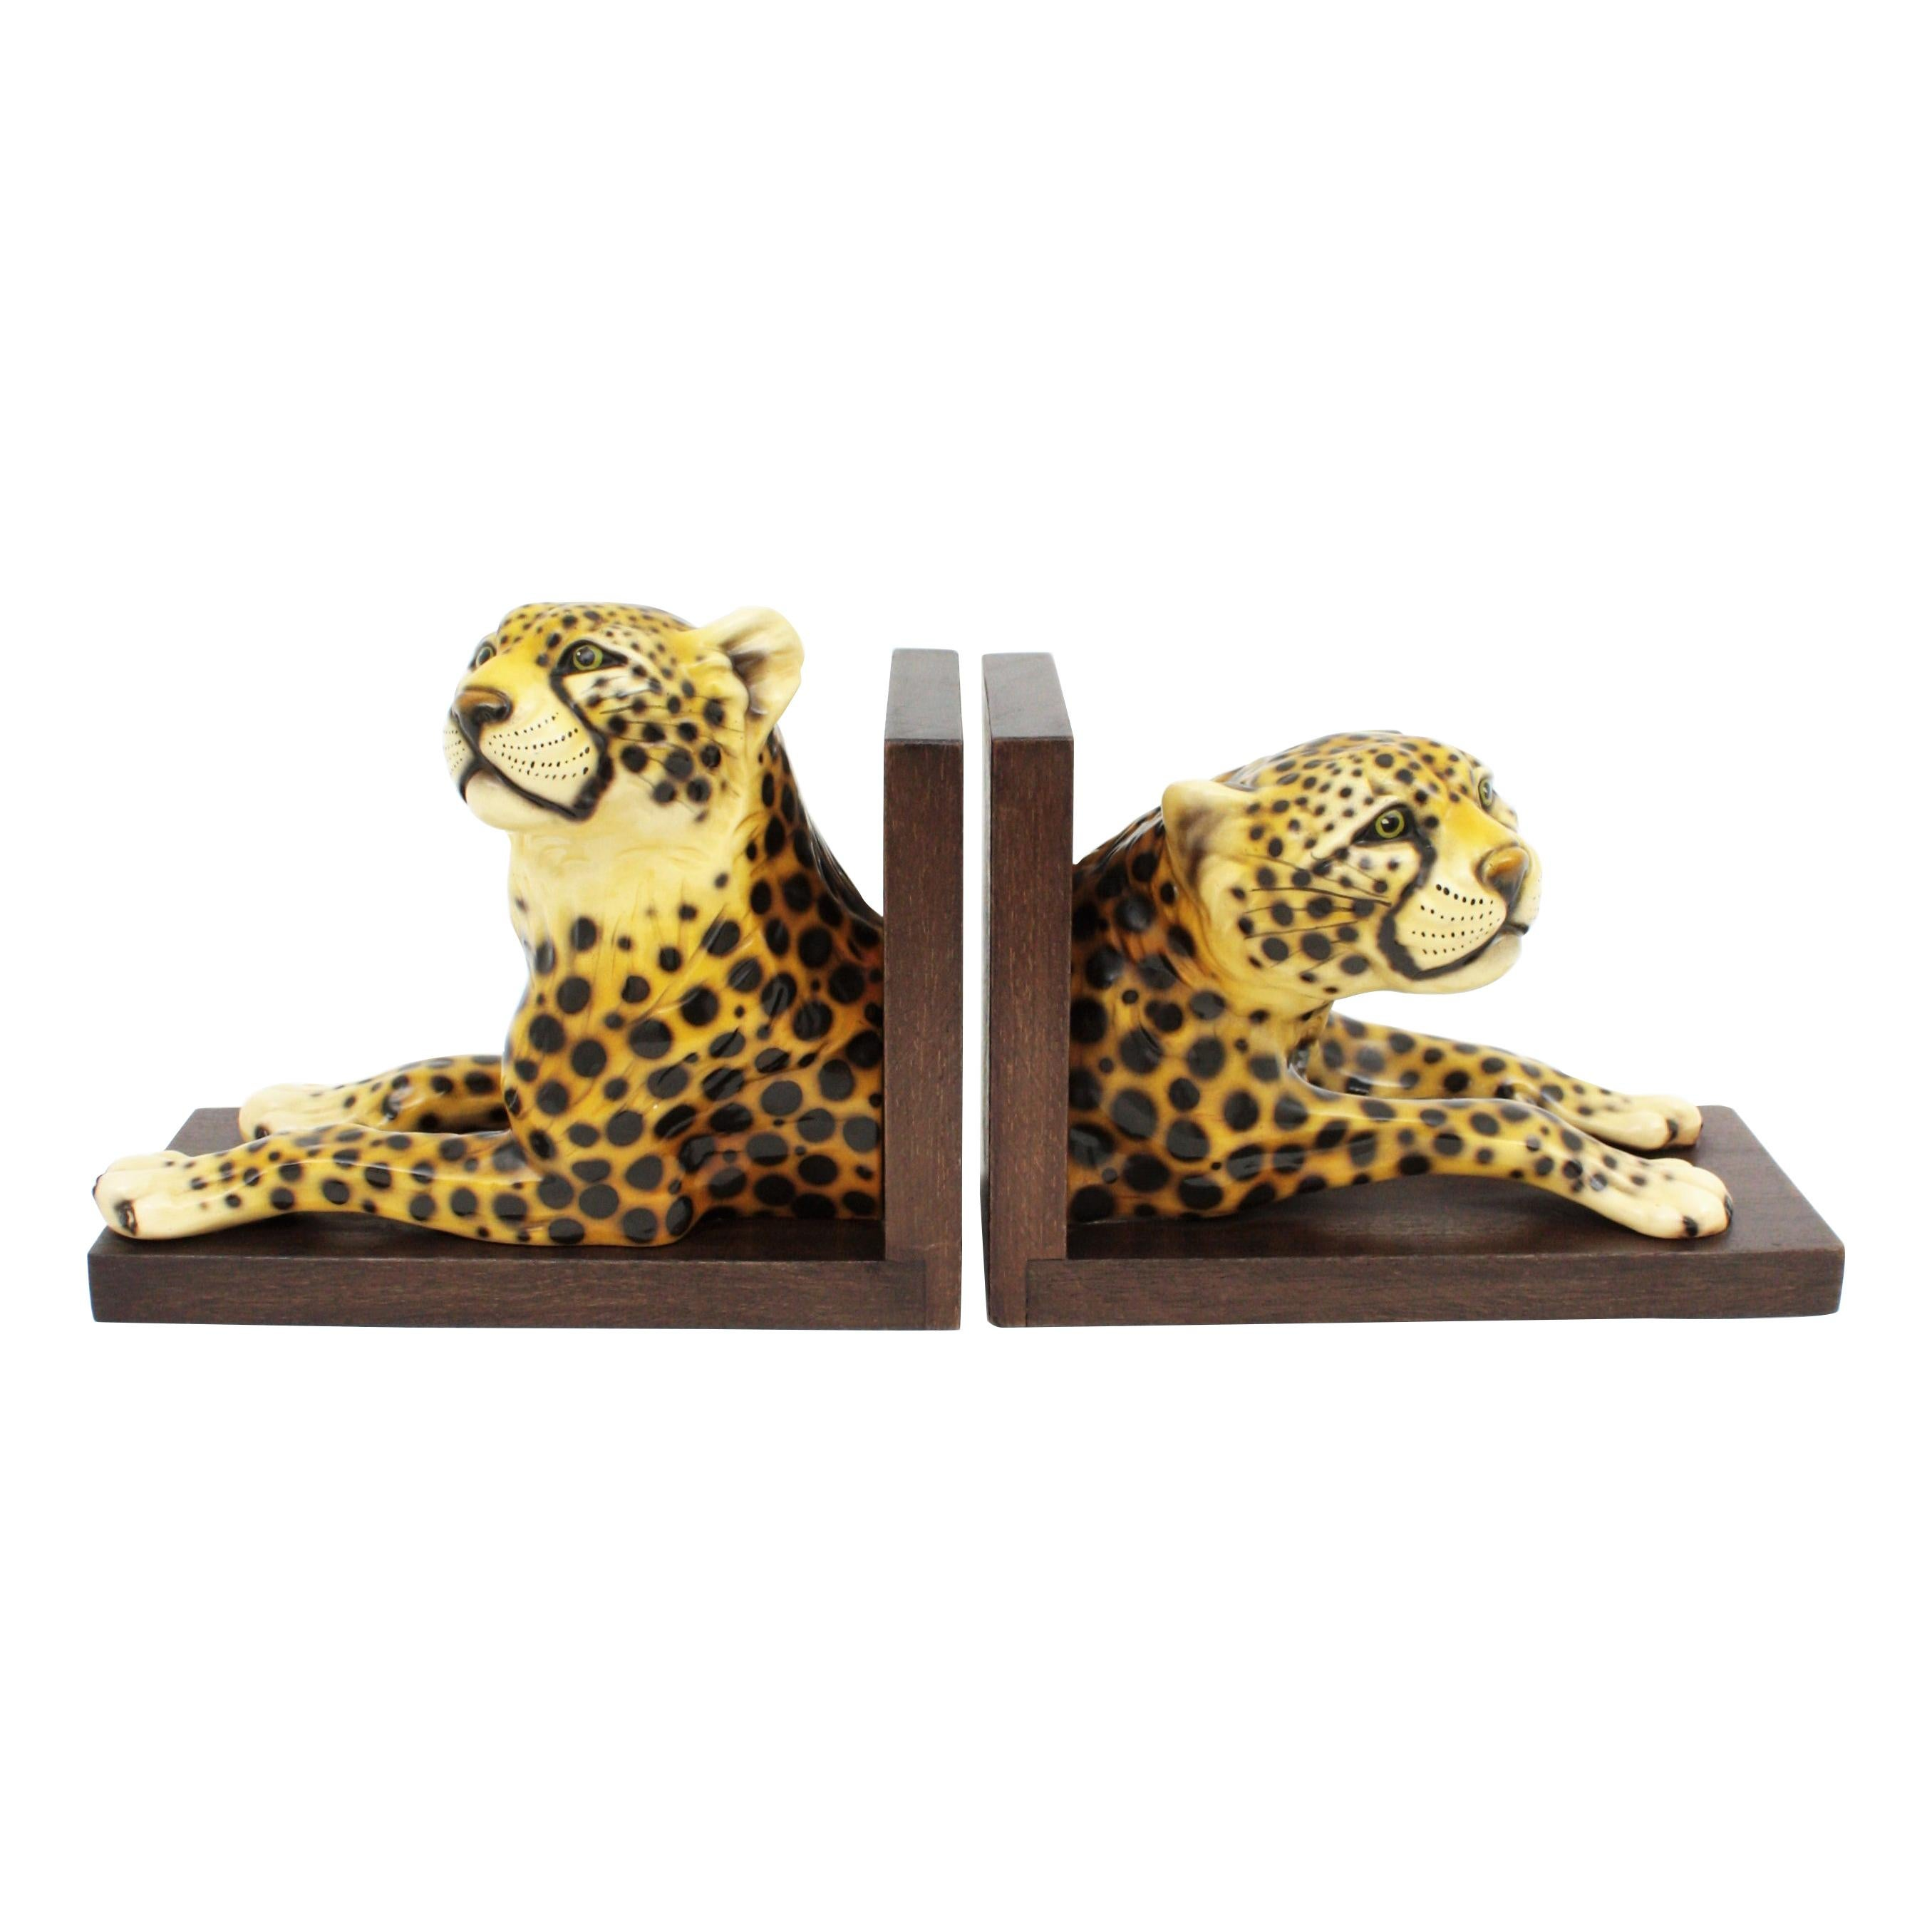 Italian Hollywood Regency Cheetah Ceramic Bookends, Set of Two